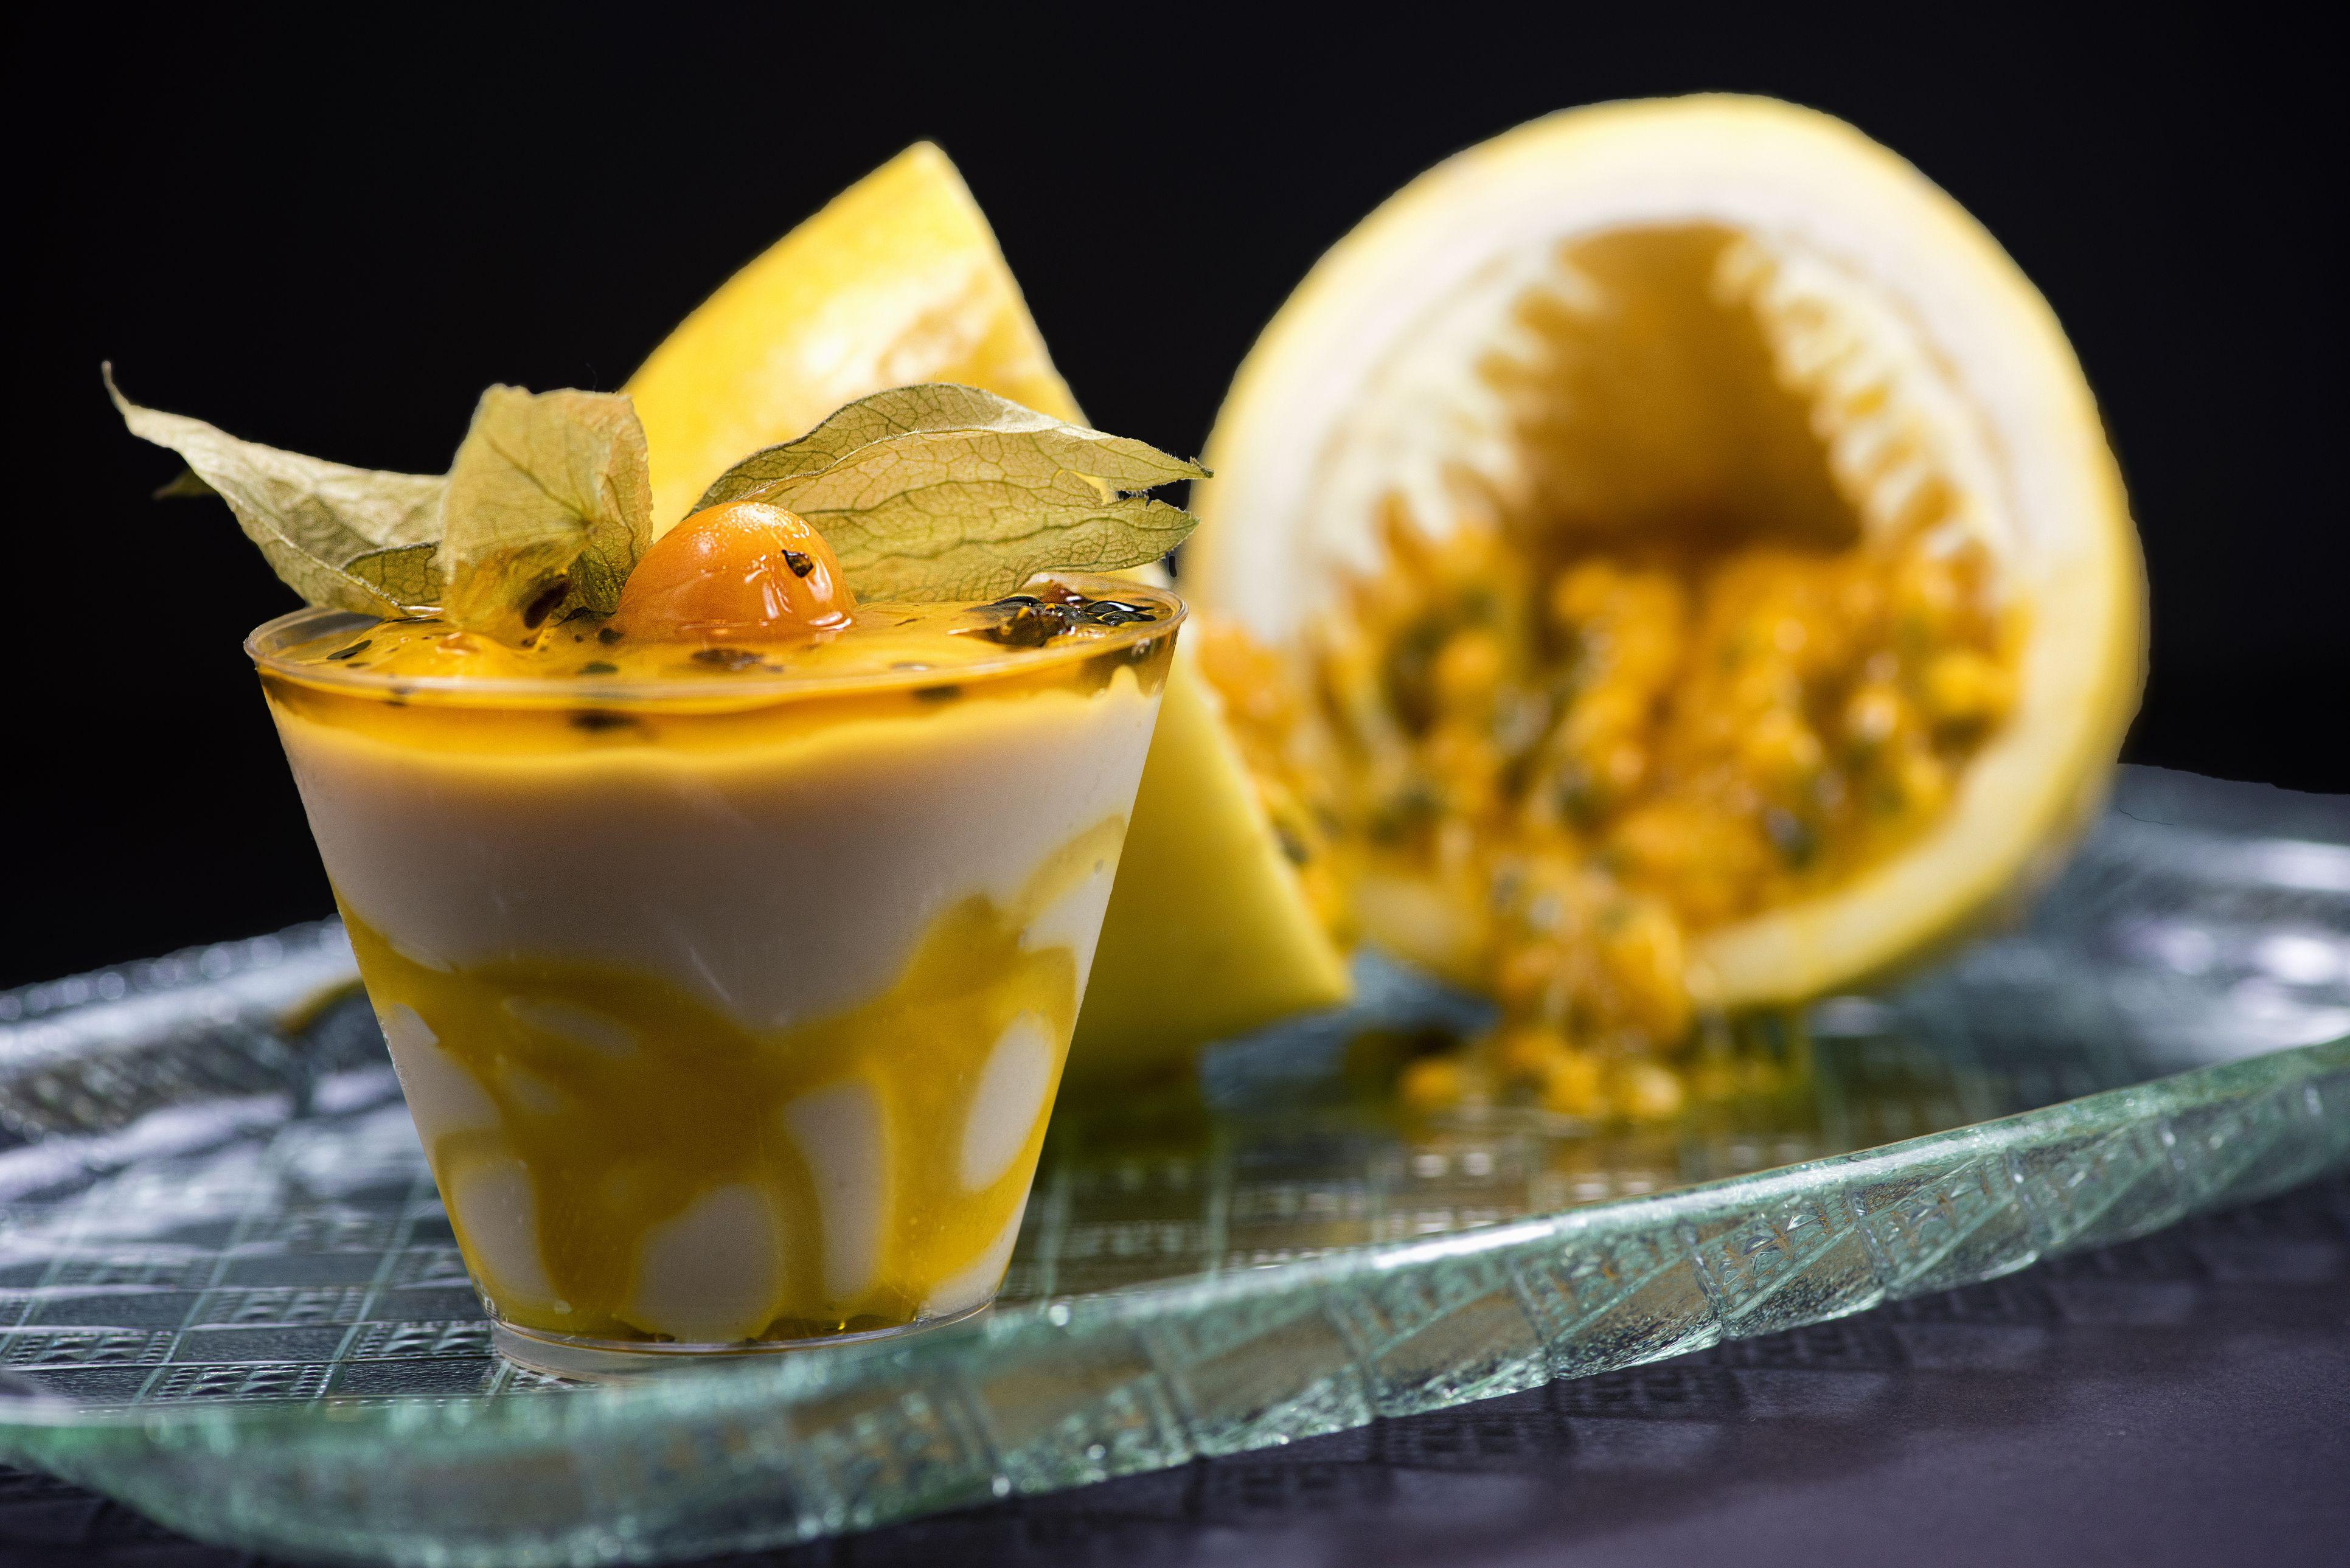 Passion Fruit Desserts  Recipe for Passion Fruit Mousse a Tropical Treat